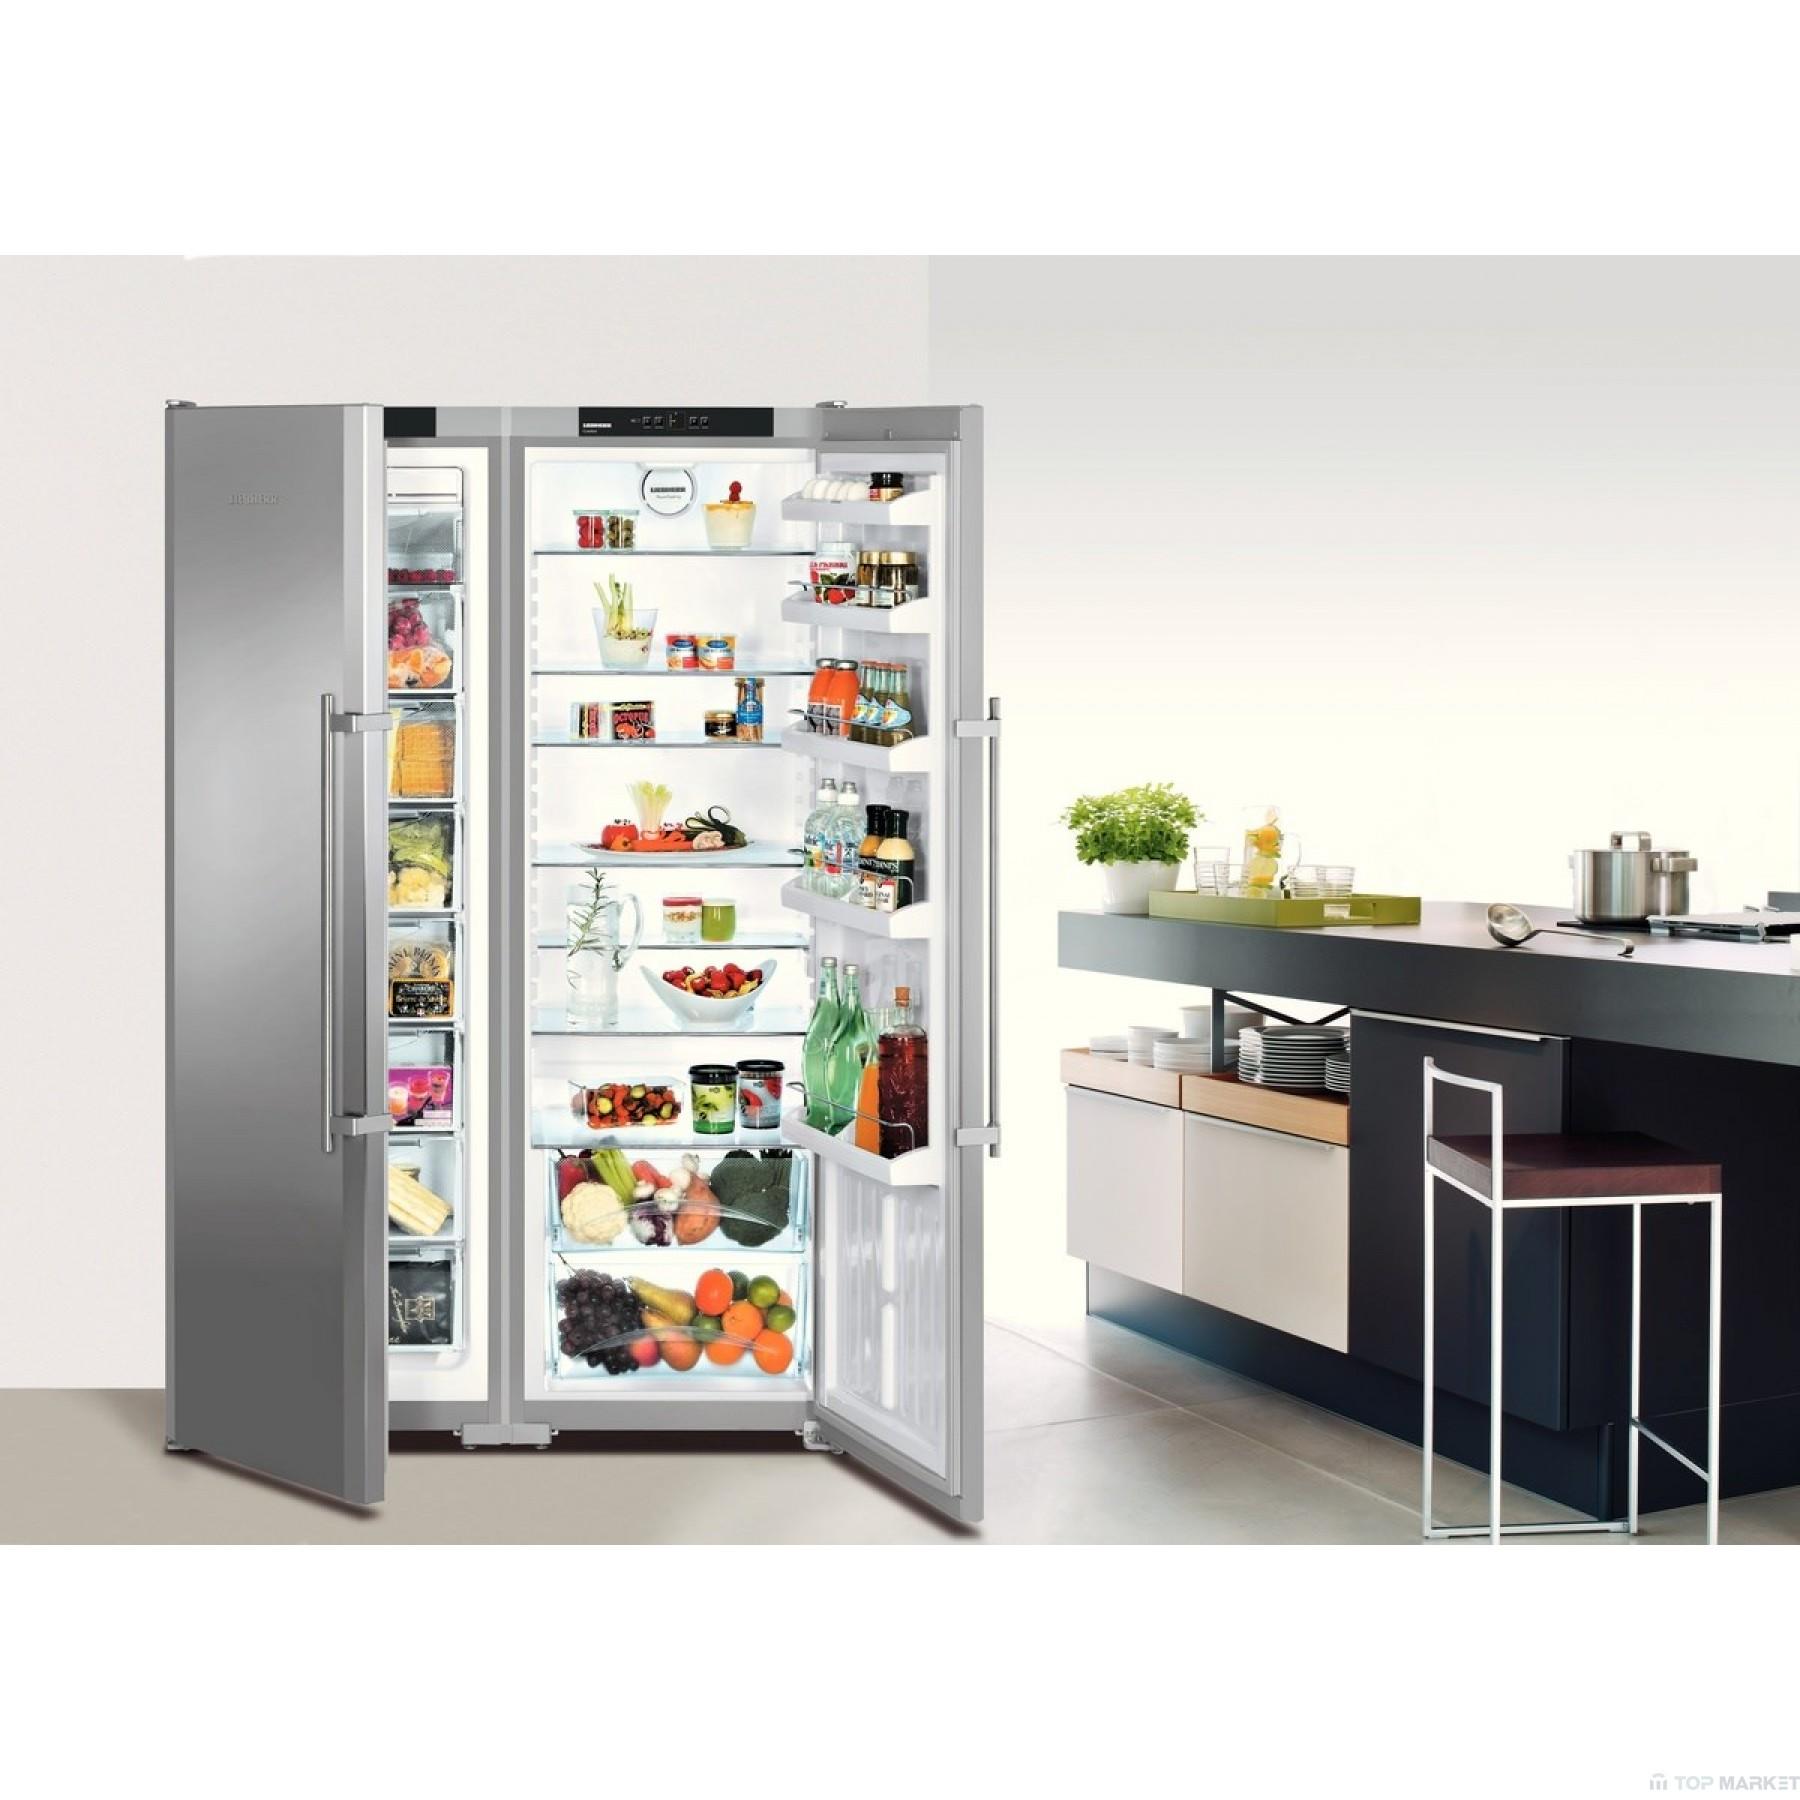 Хладилник SIDE BY SIDE LIEBHERR SBSesf 7212